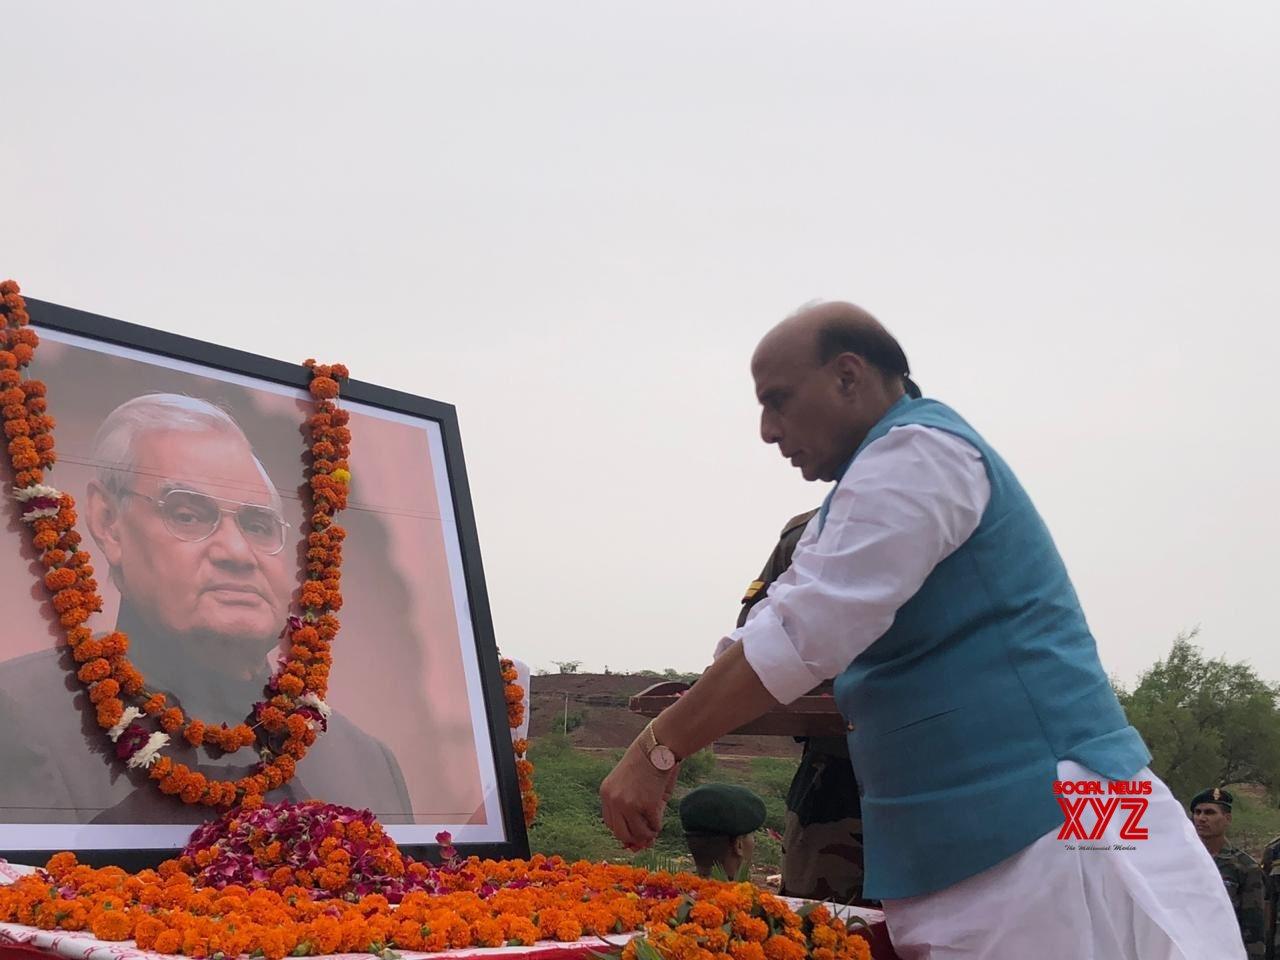 Pokhran (Rajasthan): Atal Bihari Vajpayee's first death anniversary - Rajnath Singh pays tributes #Gallery